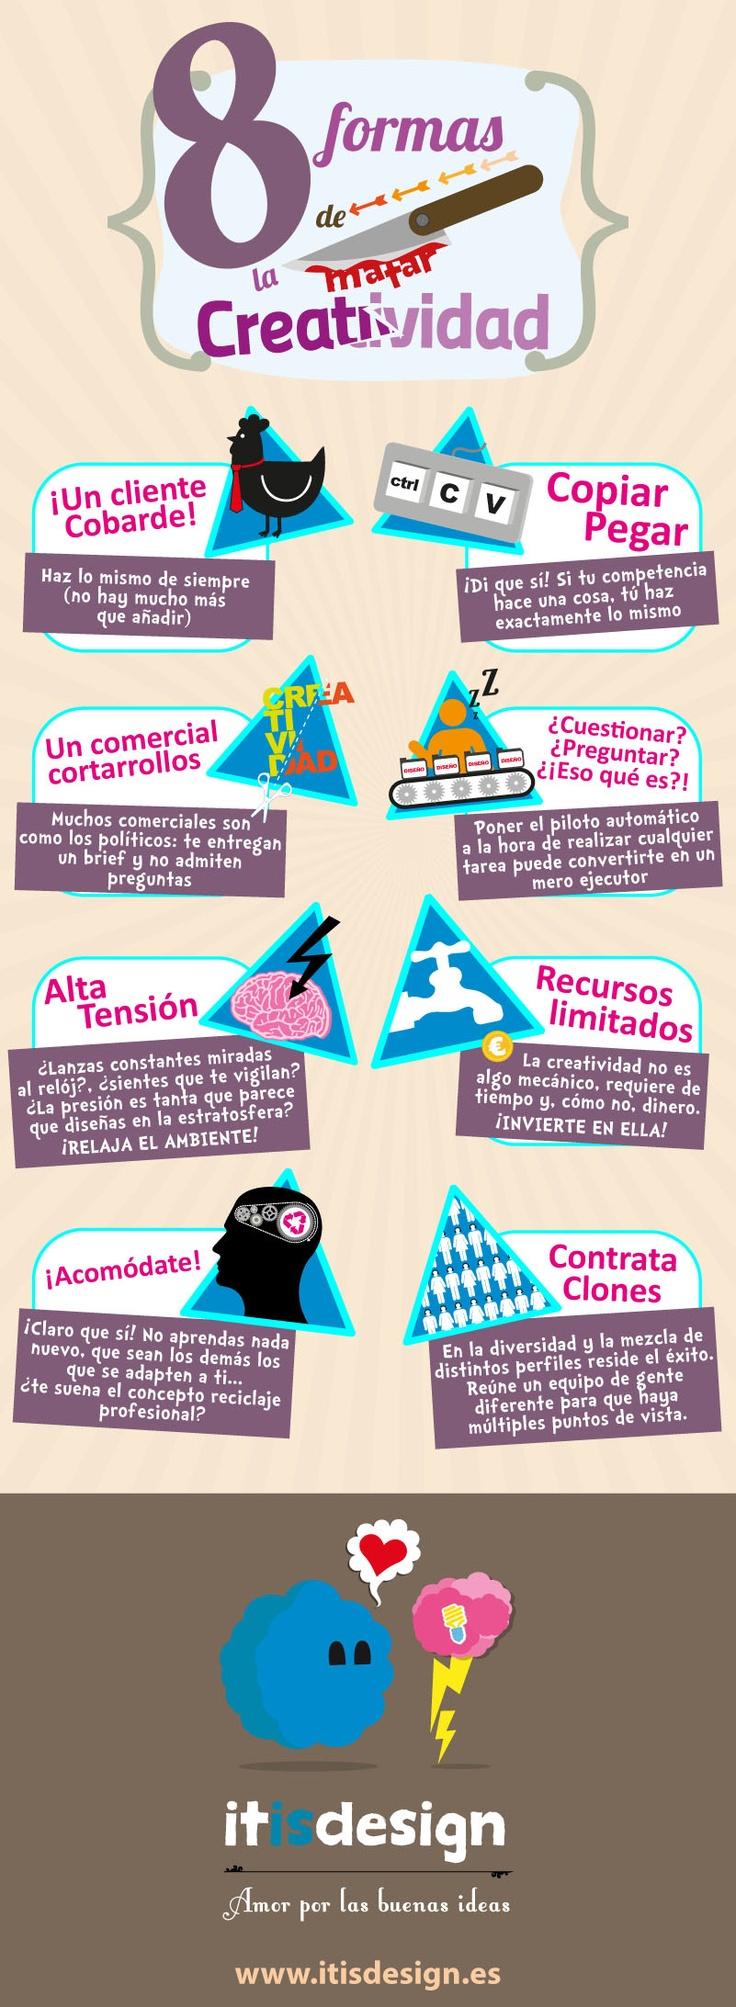 8 formas de matar la creatividad #infografia #diseno #design